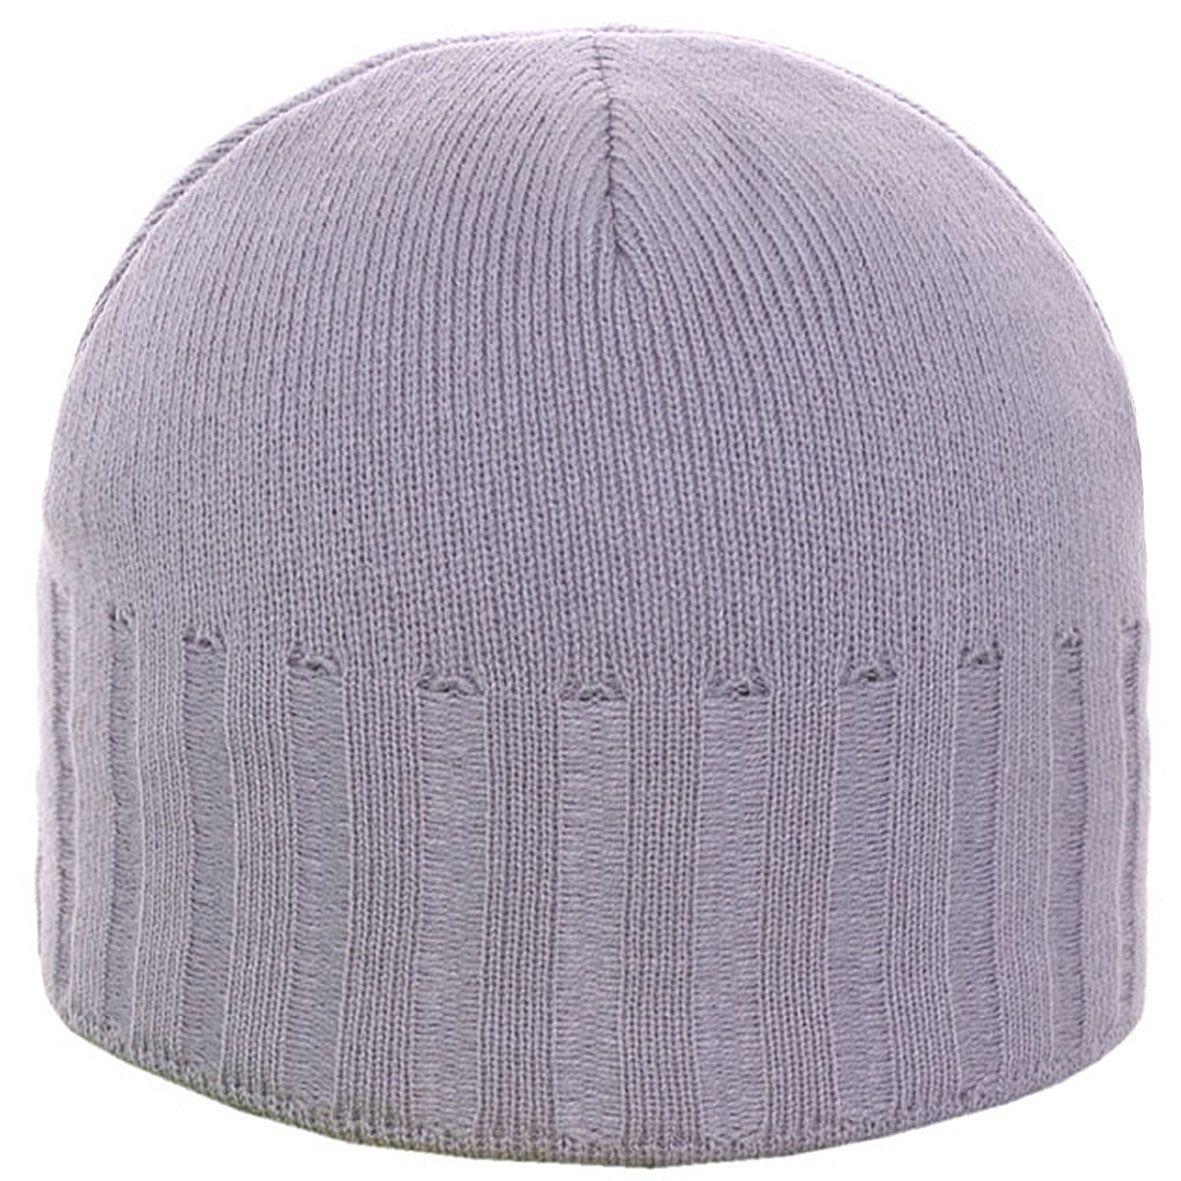 Шапка 12057 светло-серый